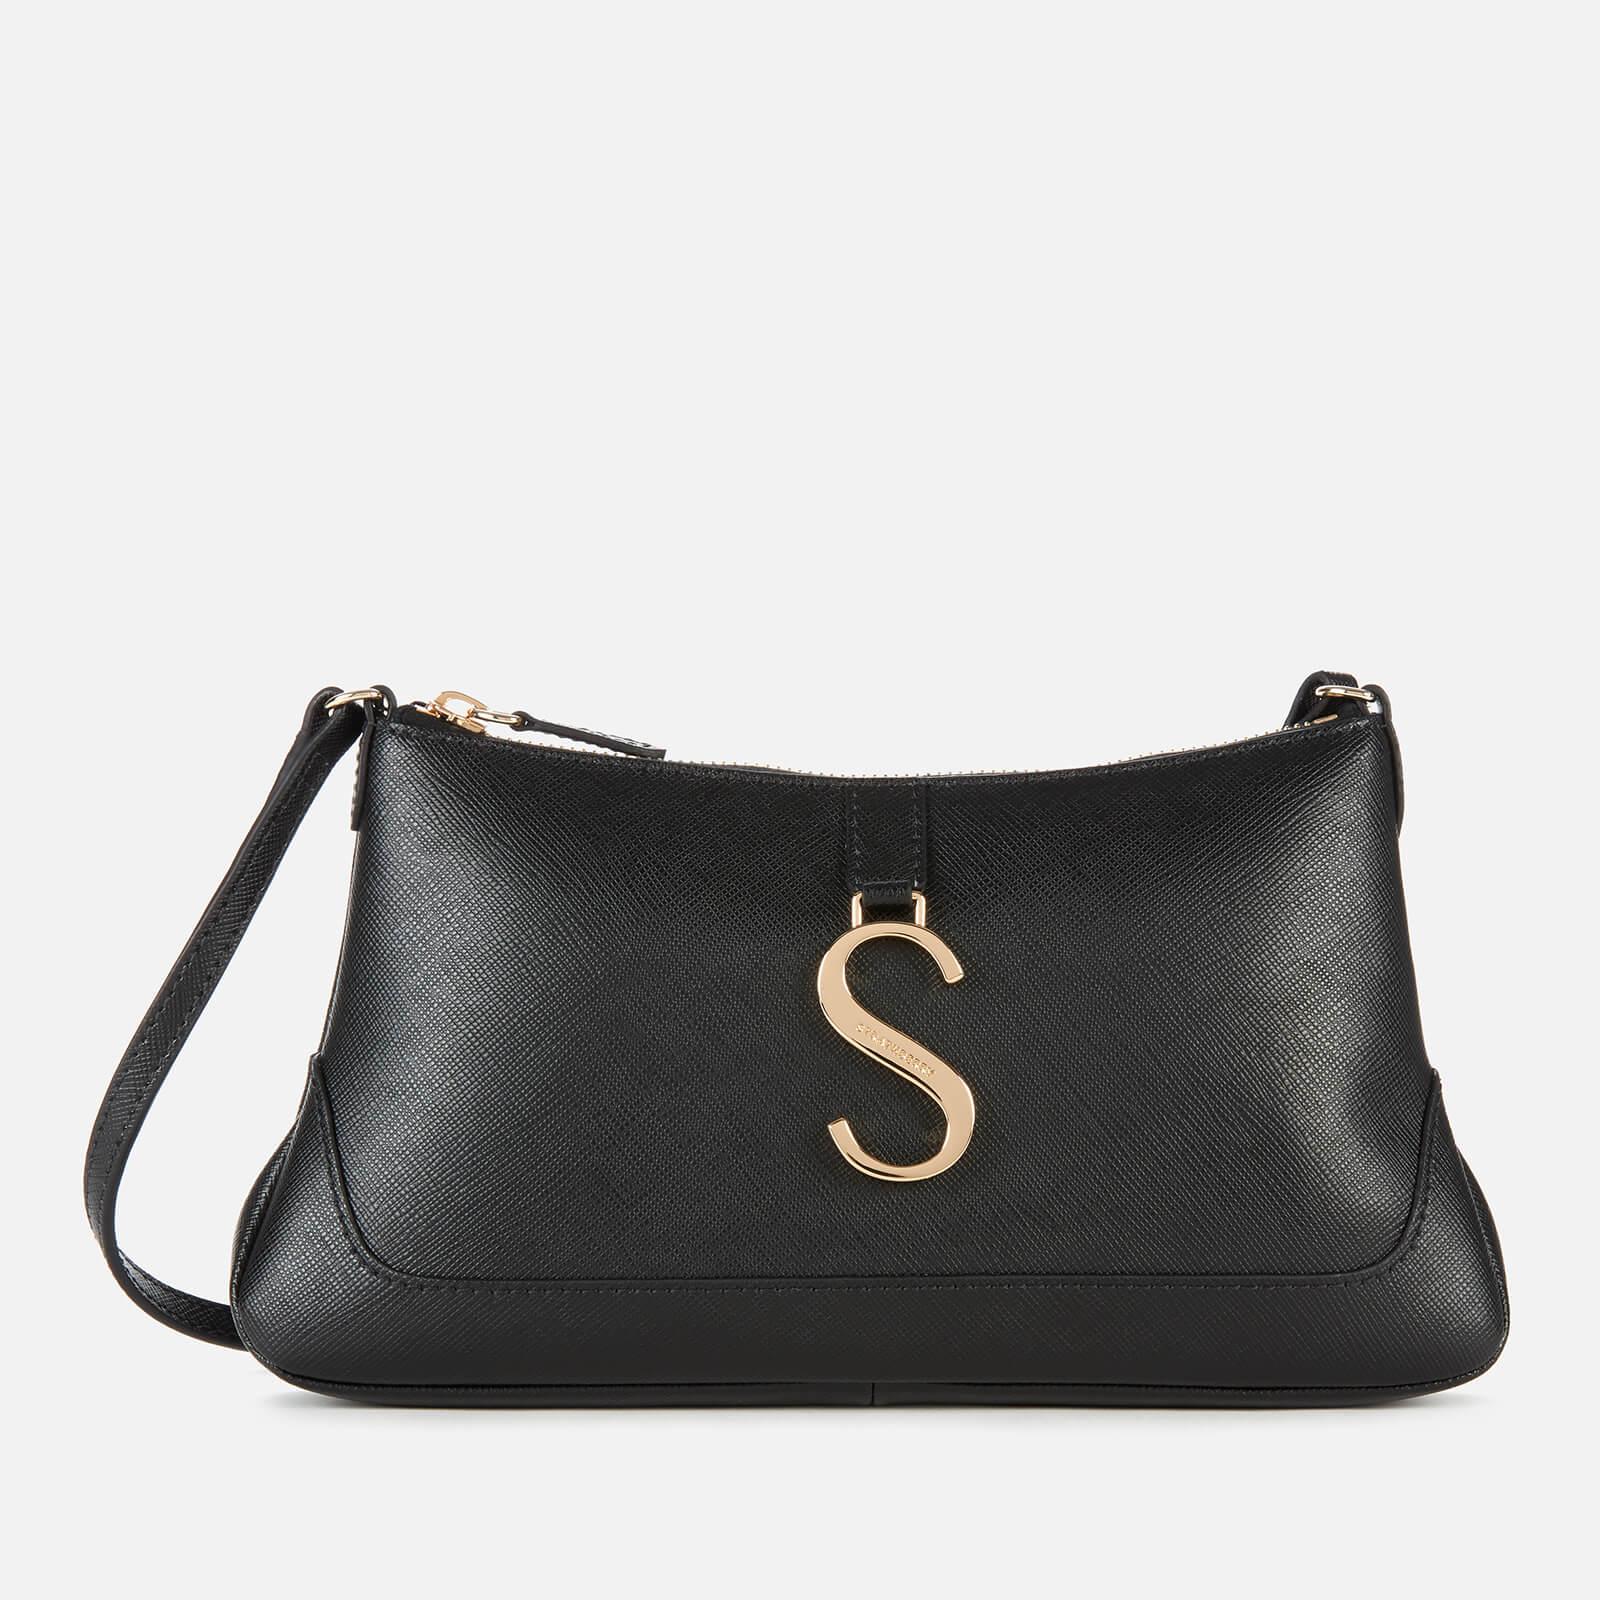 Strathberry Women's S Baguette Bag - Black